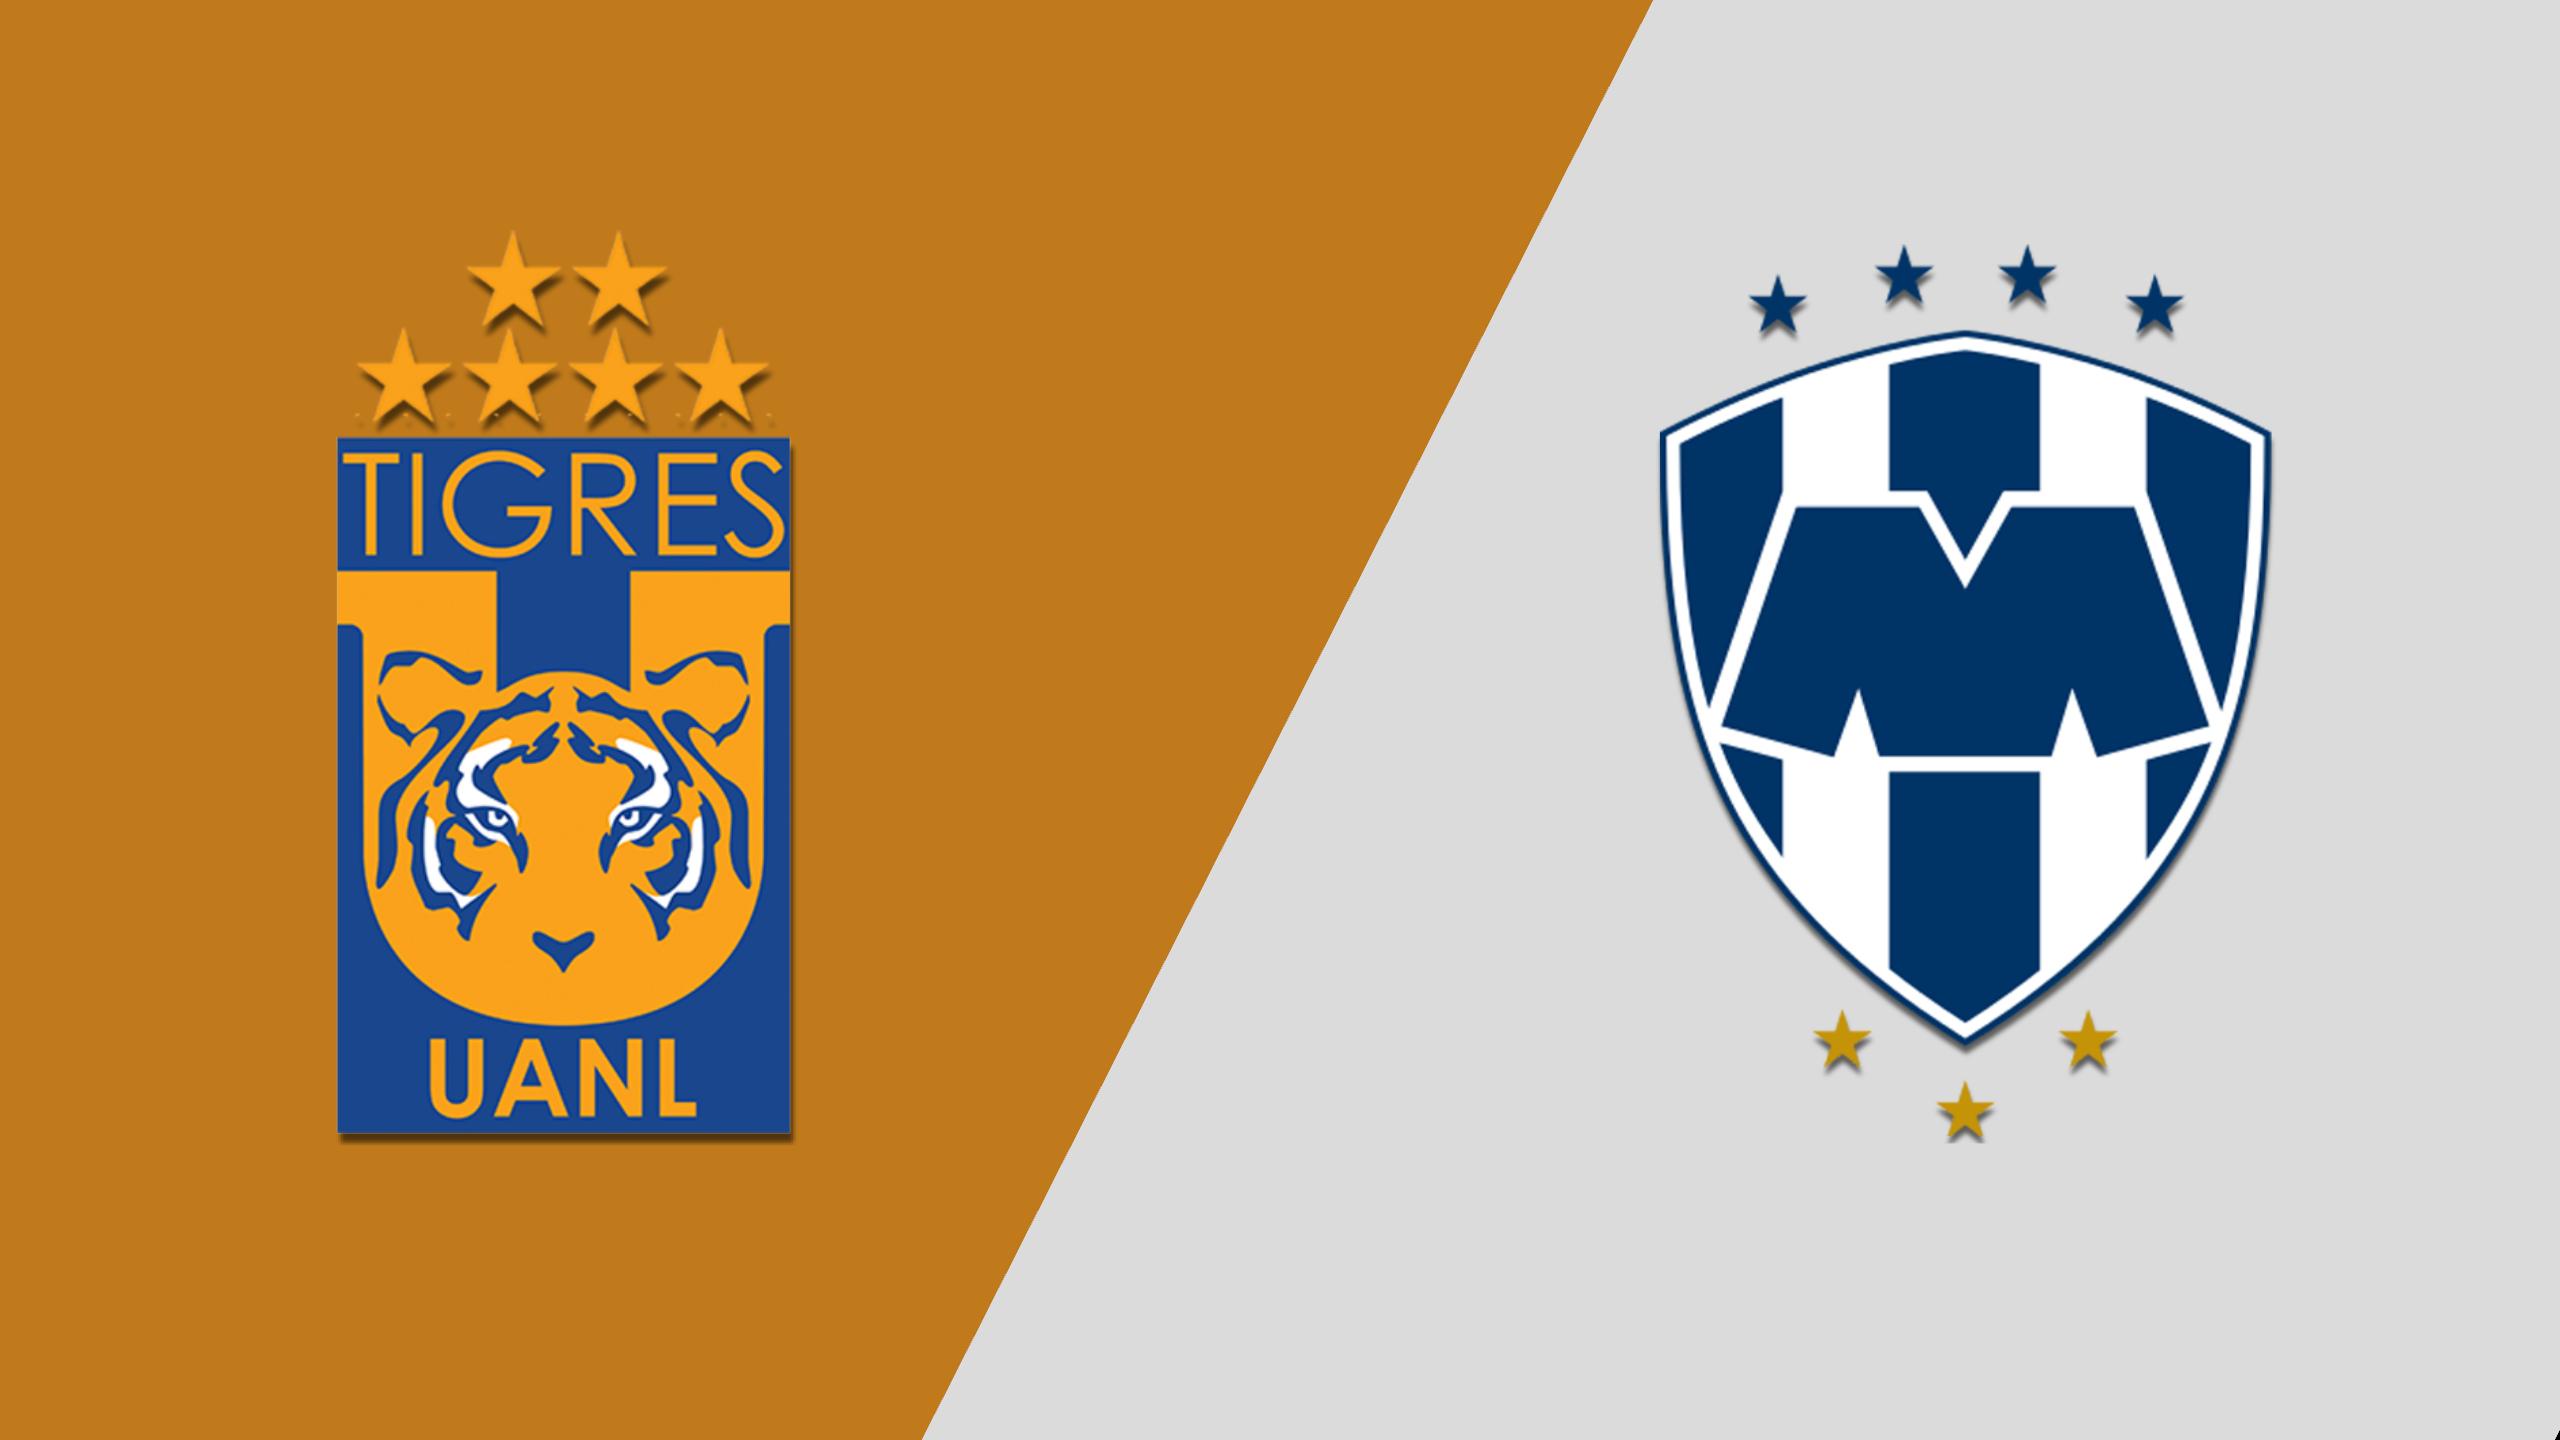 In Spanish - Tigres UANL vs. Rayados Monterrey (Jornada 10) (Liga MX)